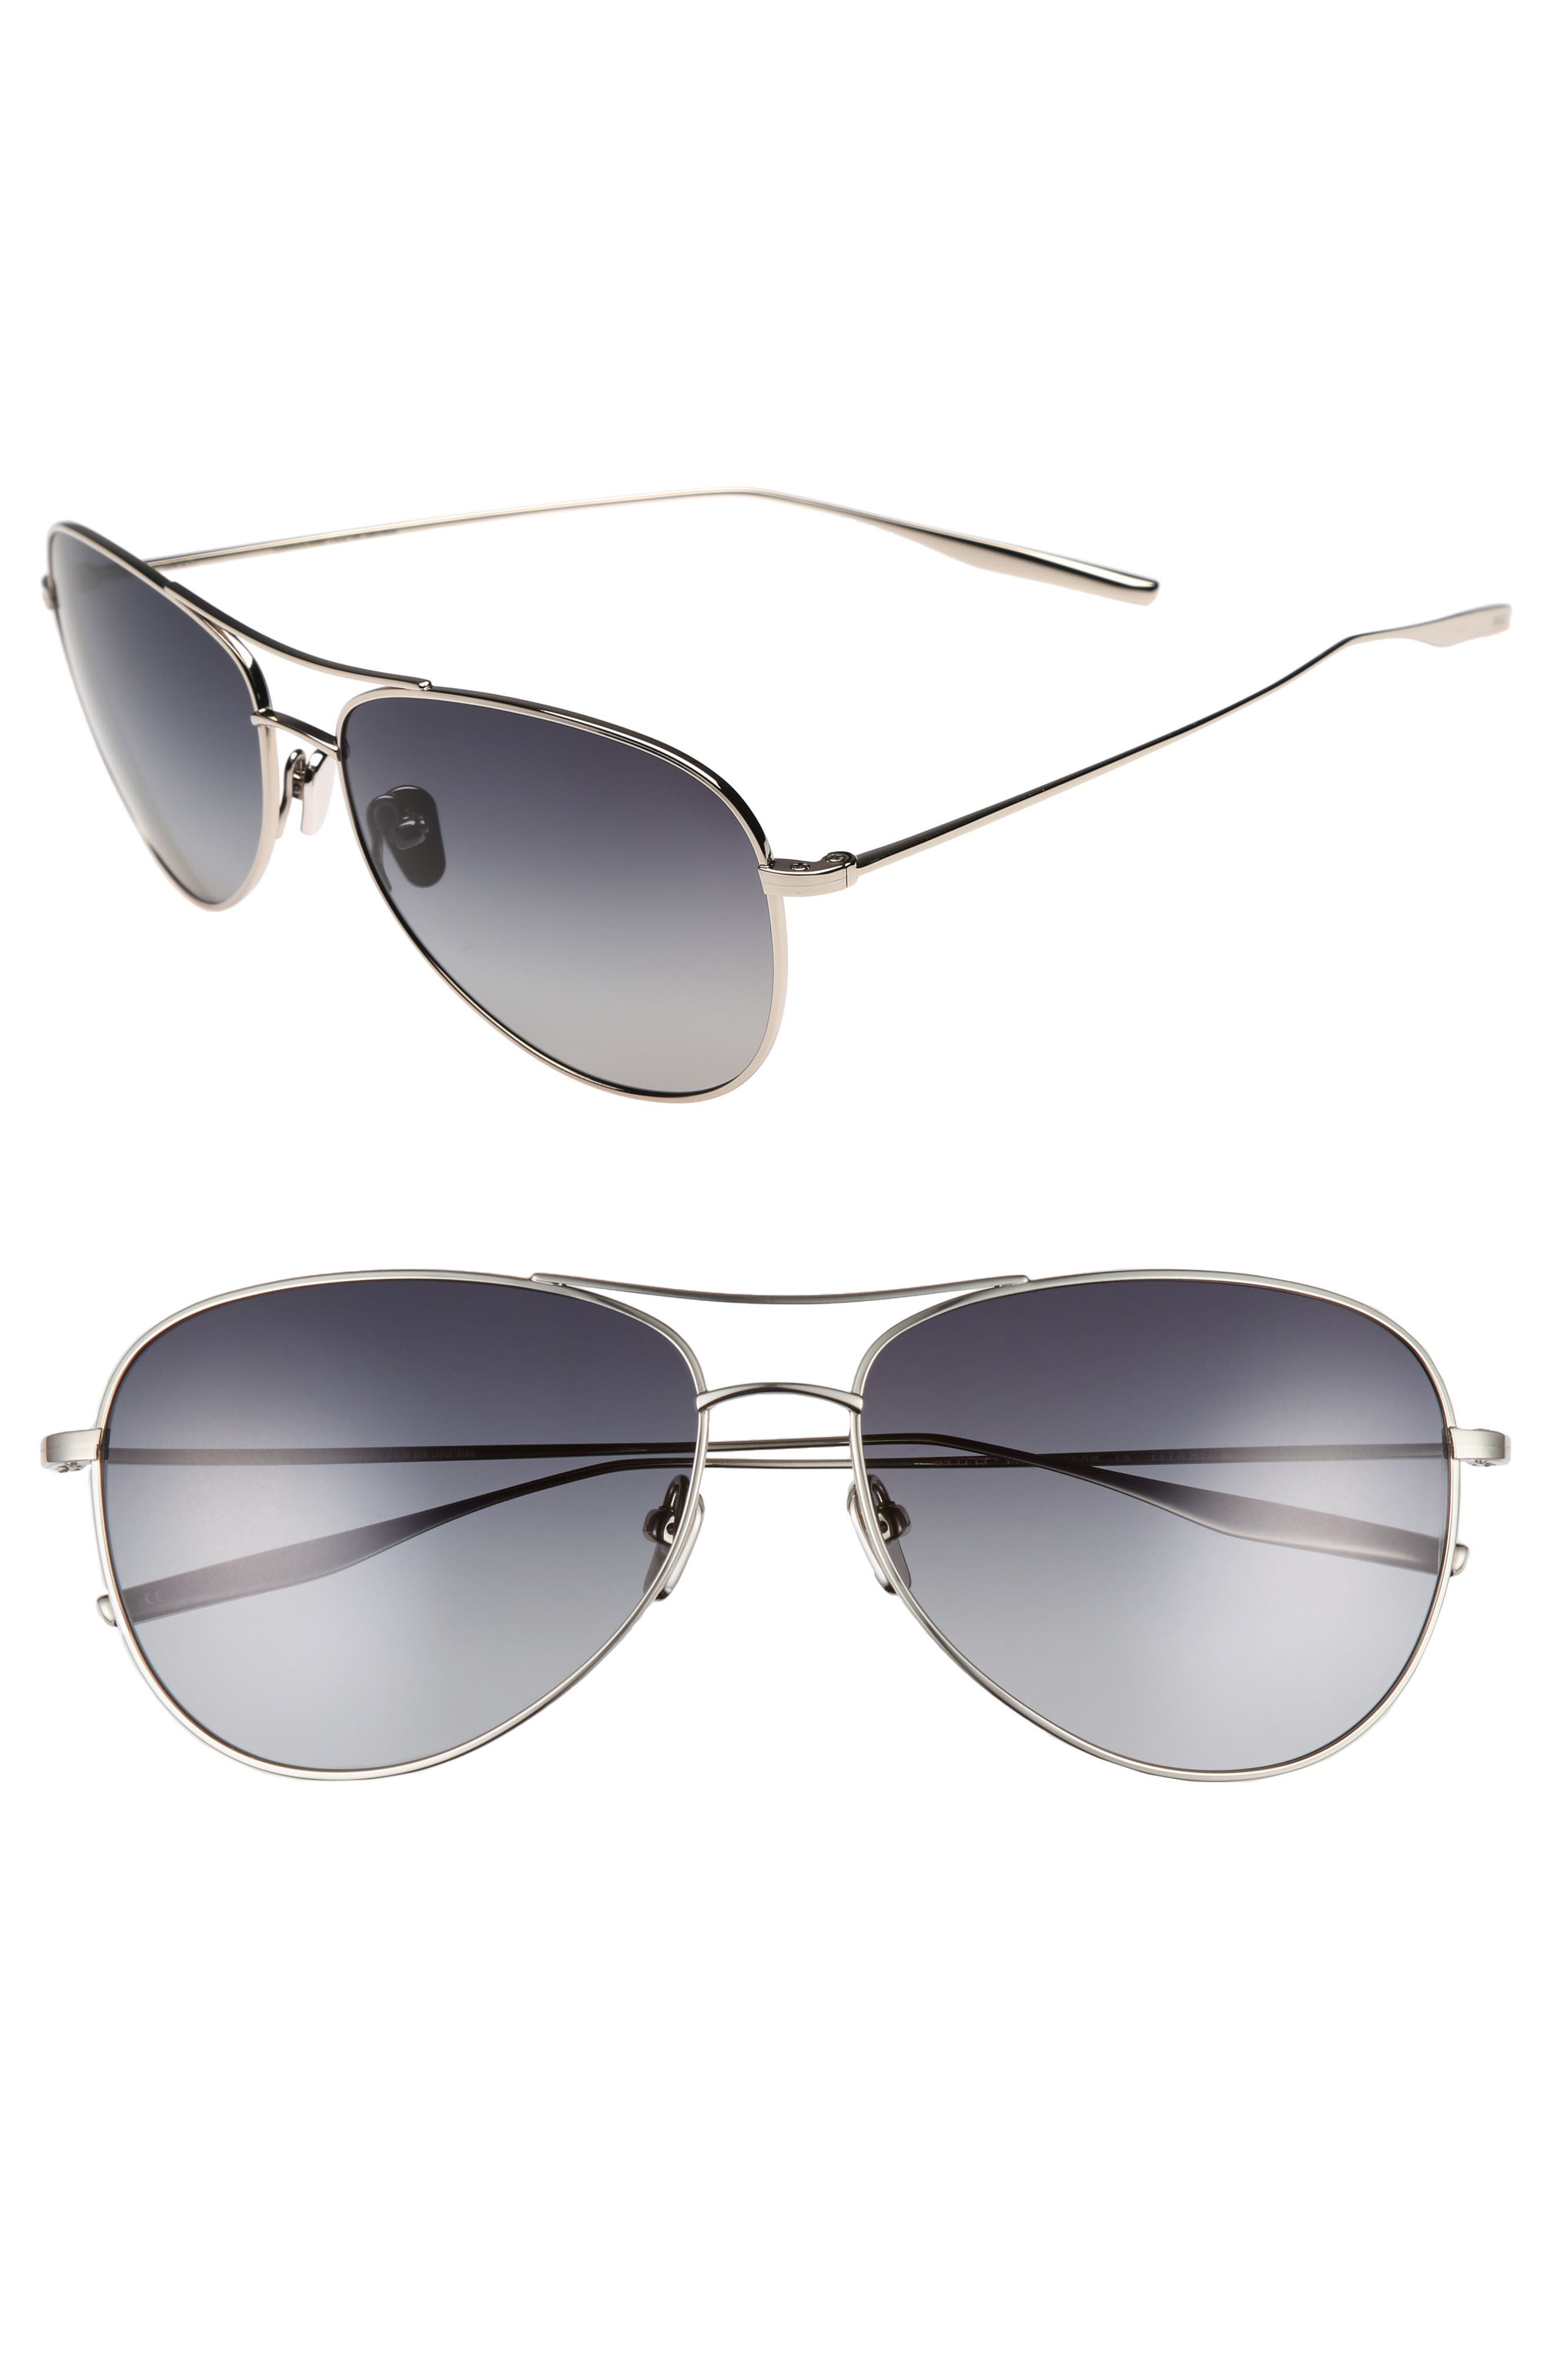 McKean 59mm Aviator Sunglasses,                             Main thumbnail 1, color,                             TRADITIONAL SILVER